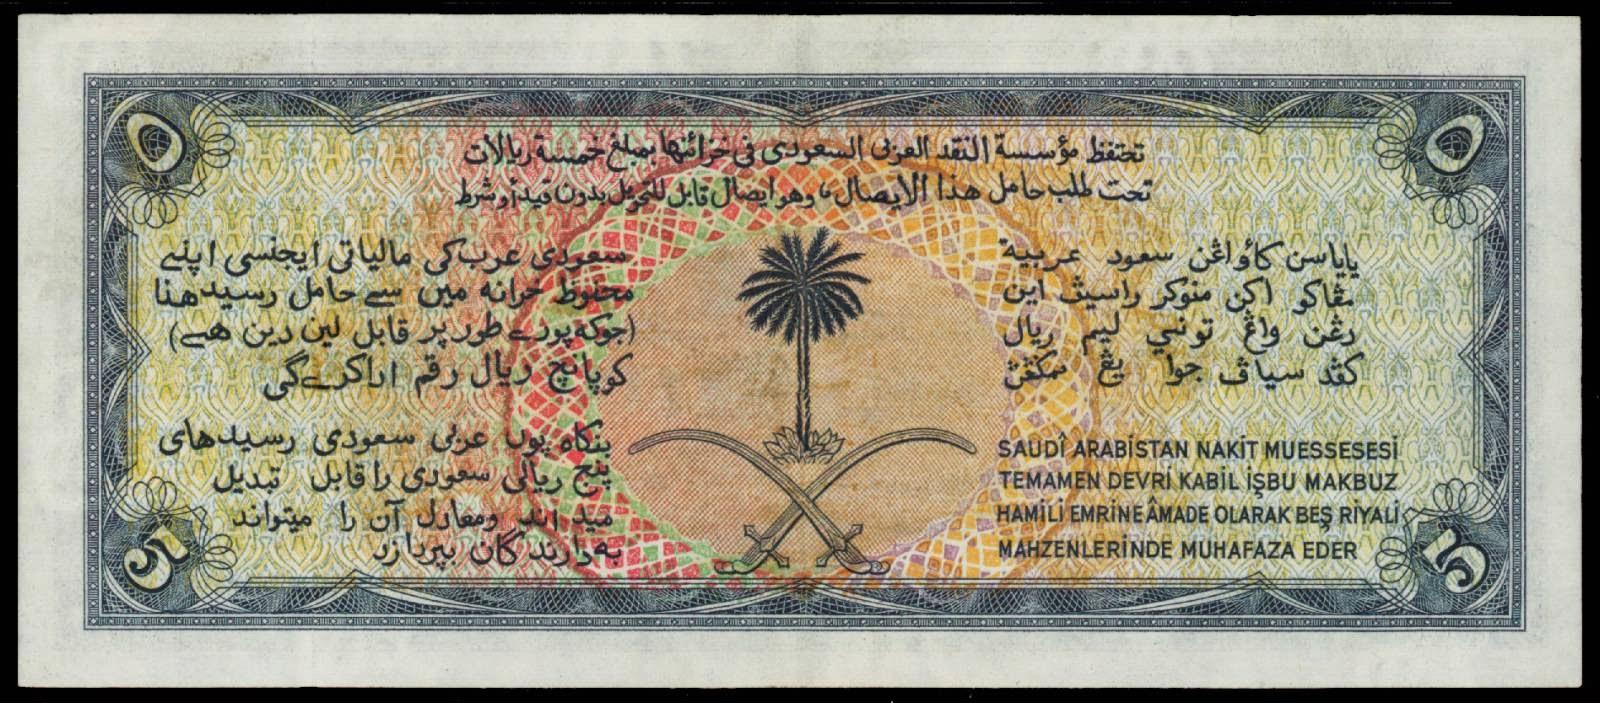 Saudi Arabia money currency 5 Riyals Note 1954 Haj Pilgrim Receipt